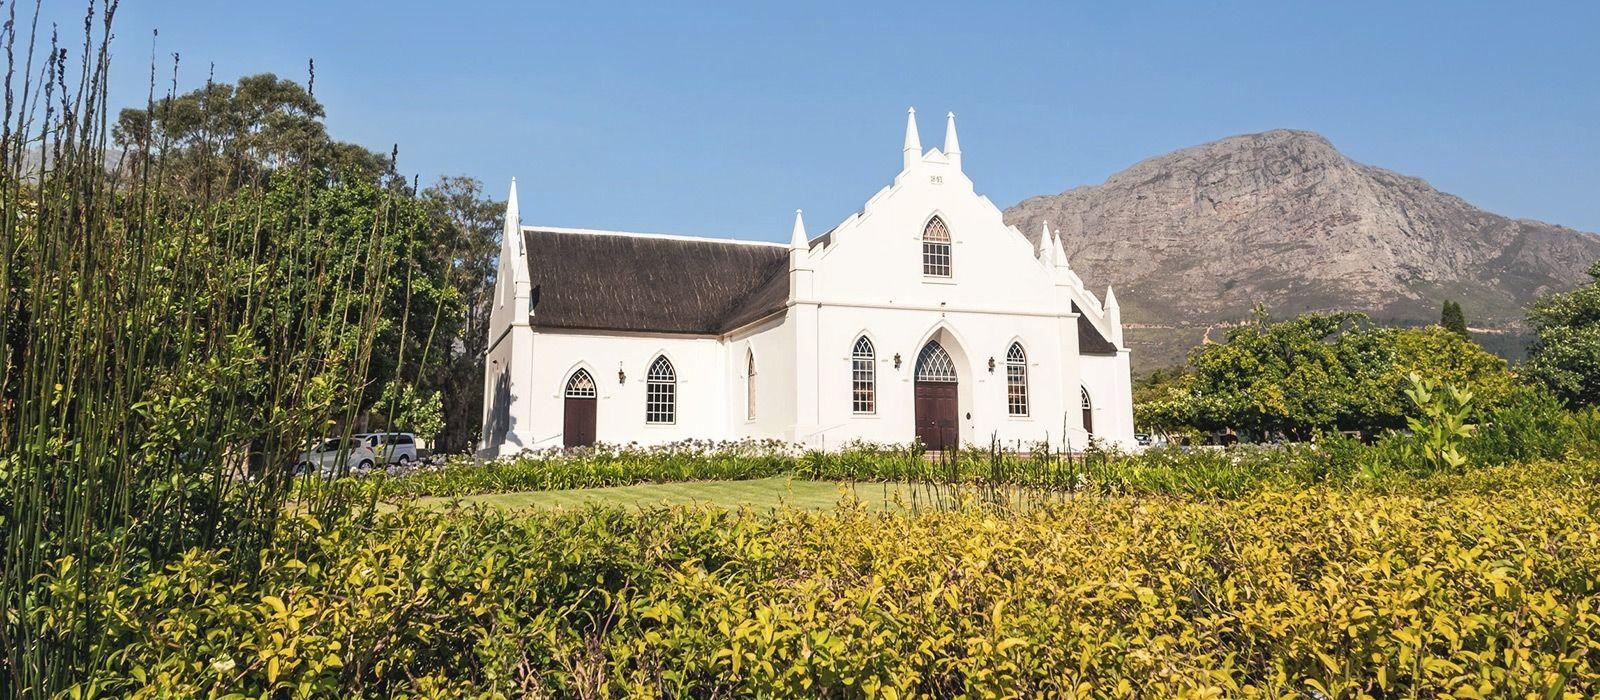 Destination Winelands South Africa